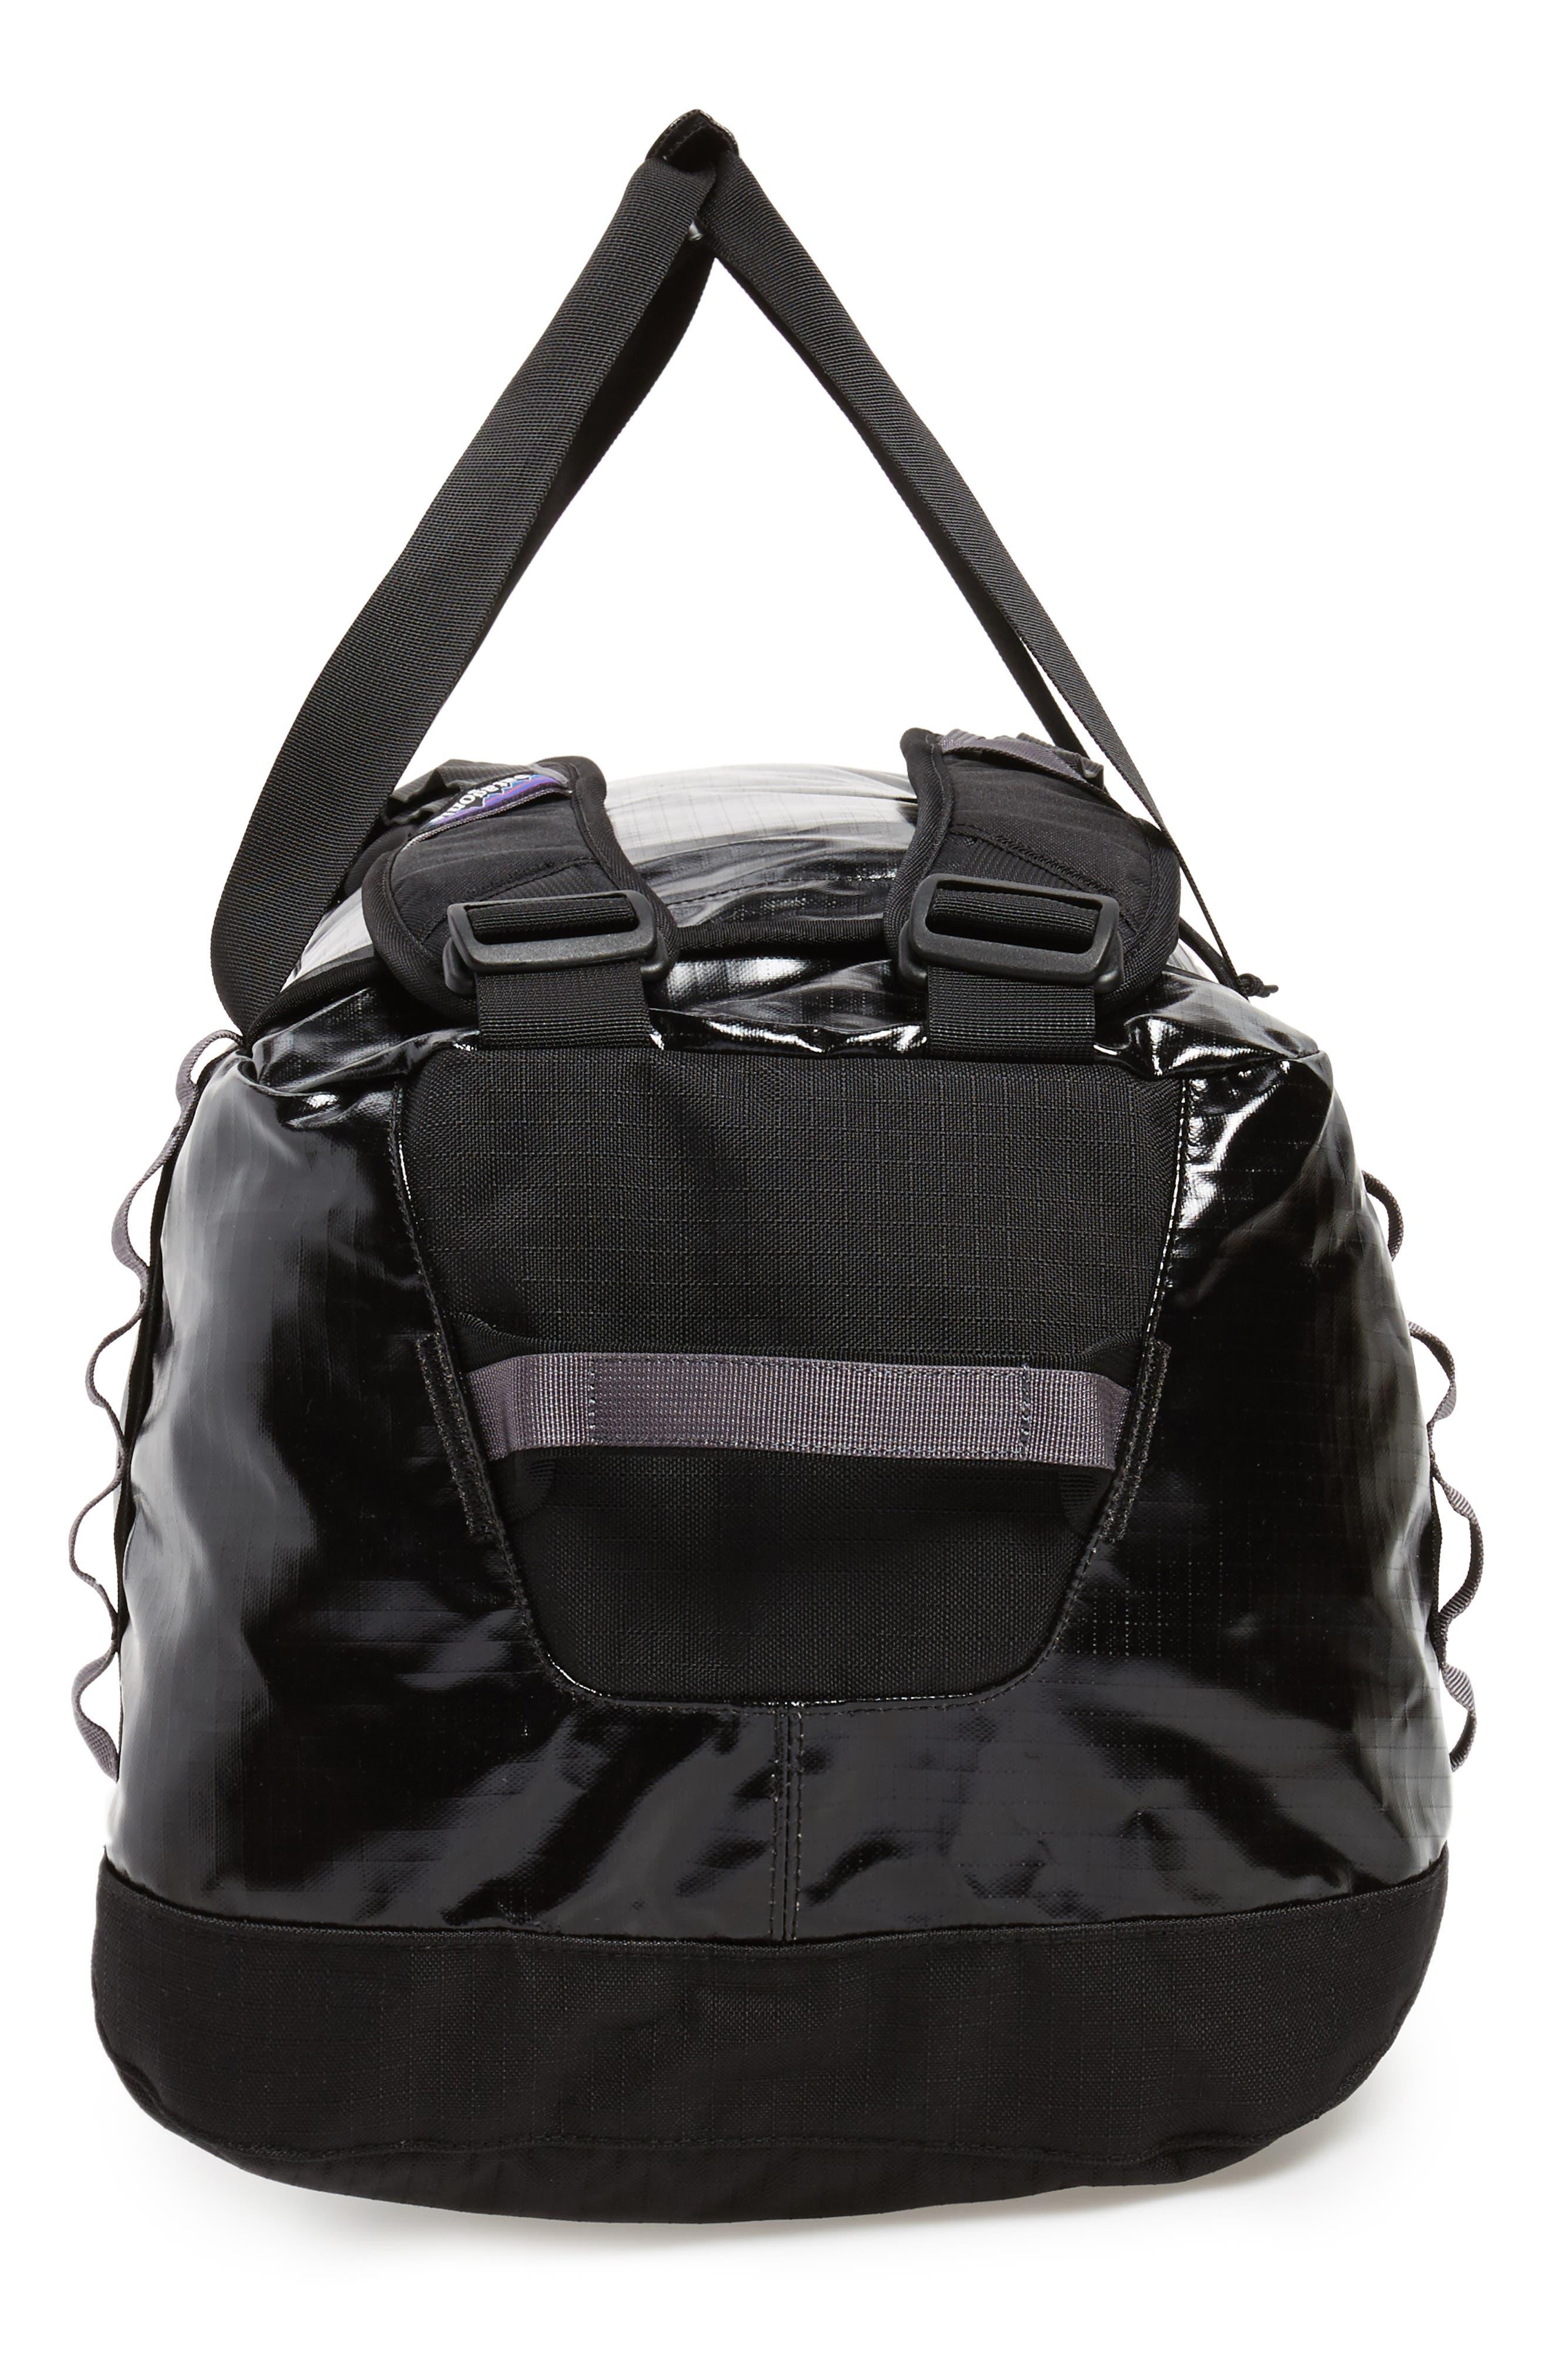 Black Hole Water Repellent Duffel Bag,                             Alternate thumbnail 5, color,                             001